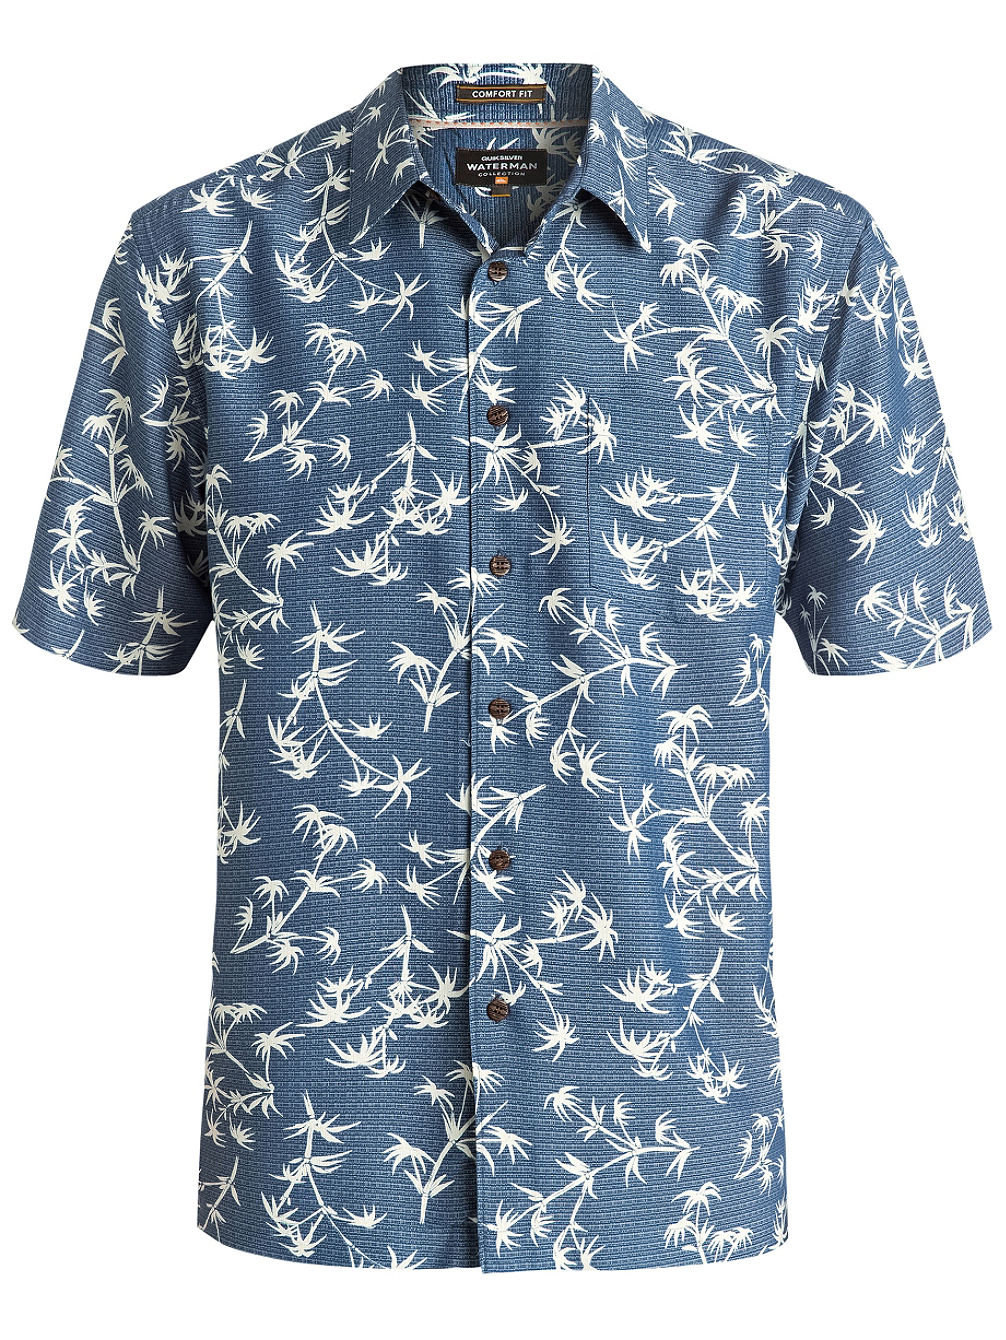 quiksilver-skinny-palms-shirt